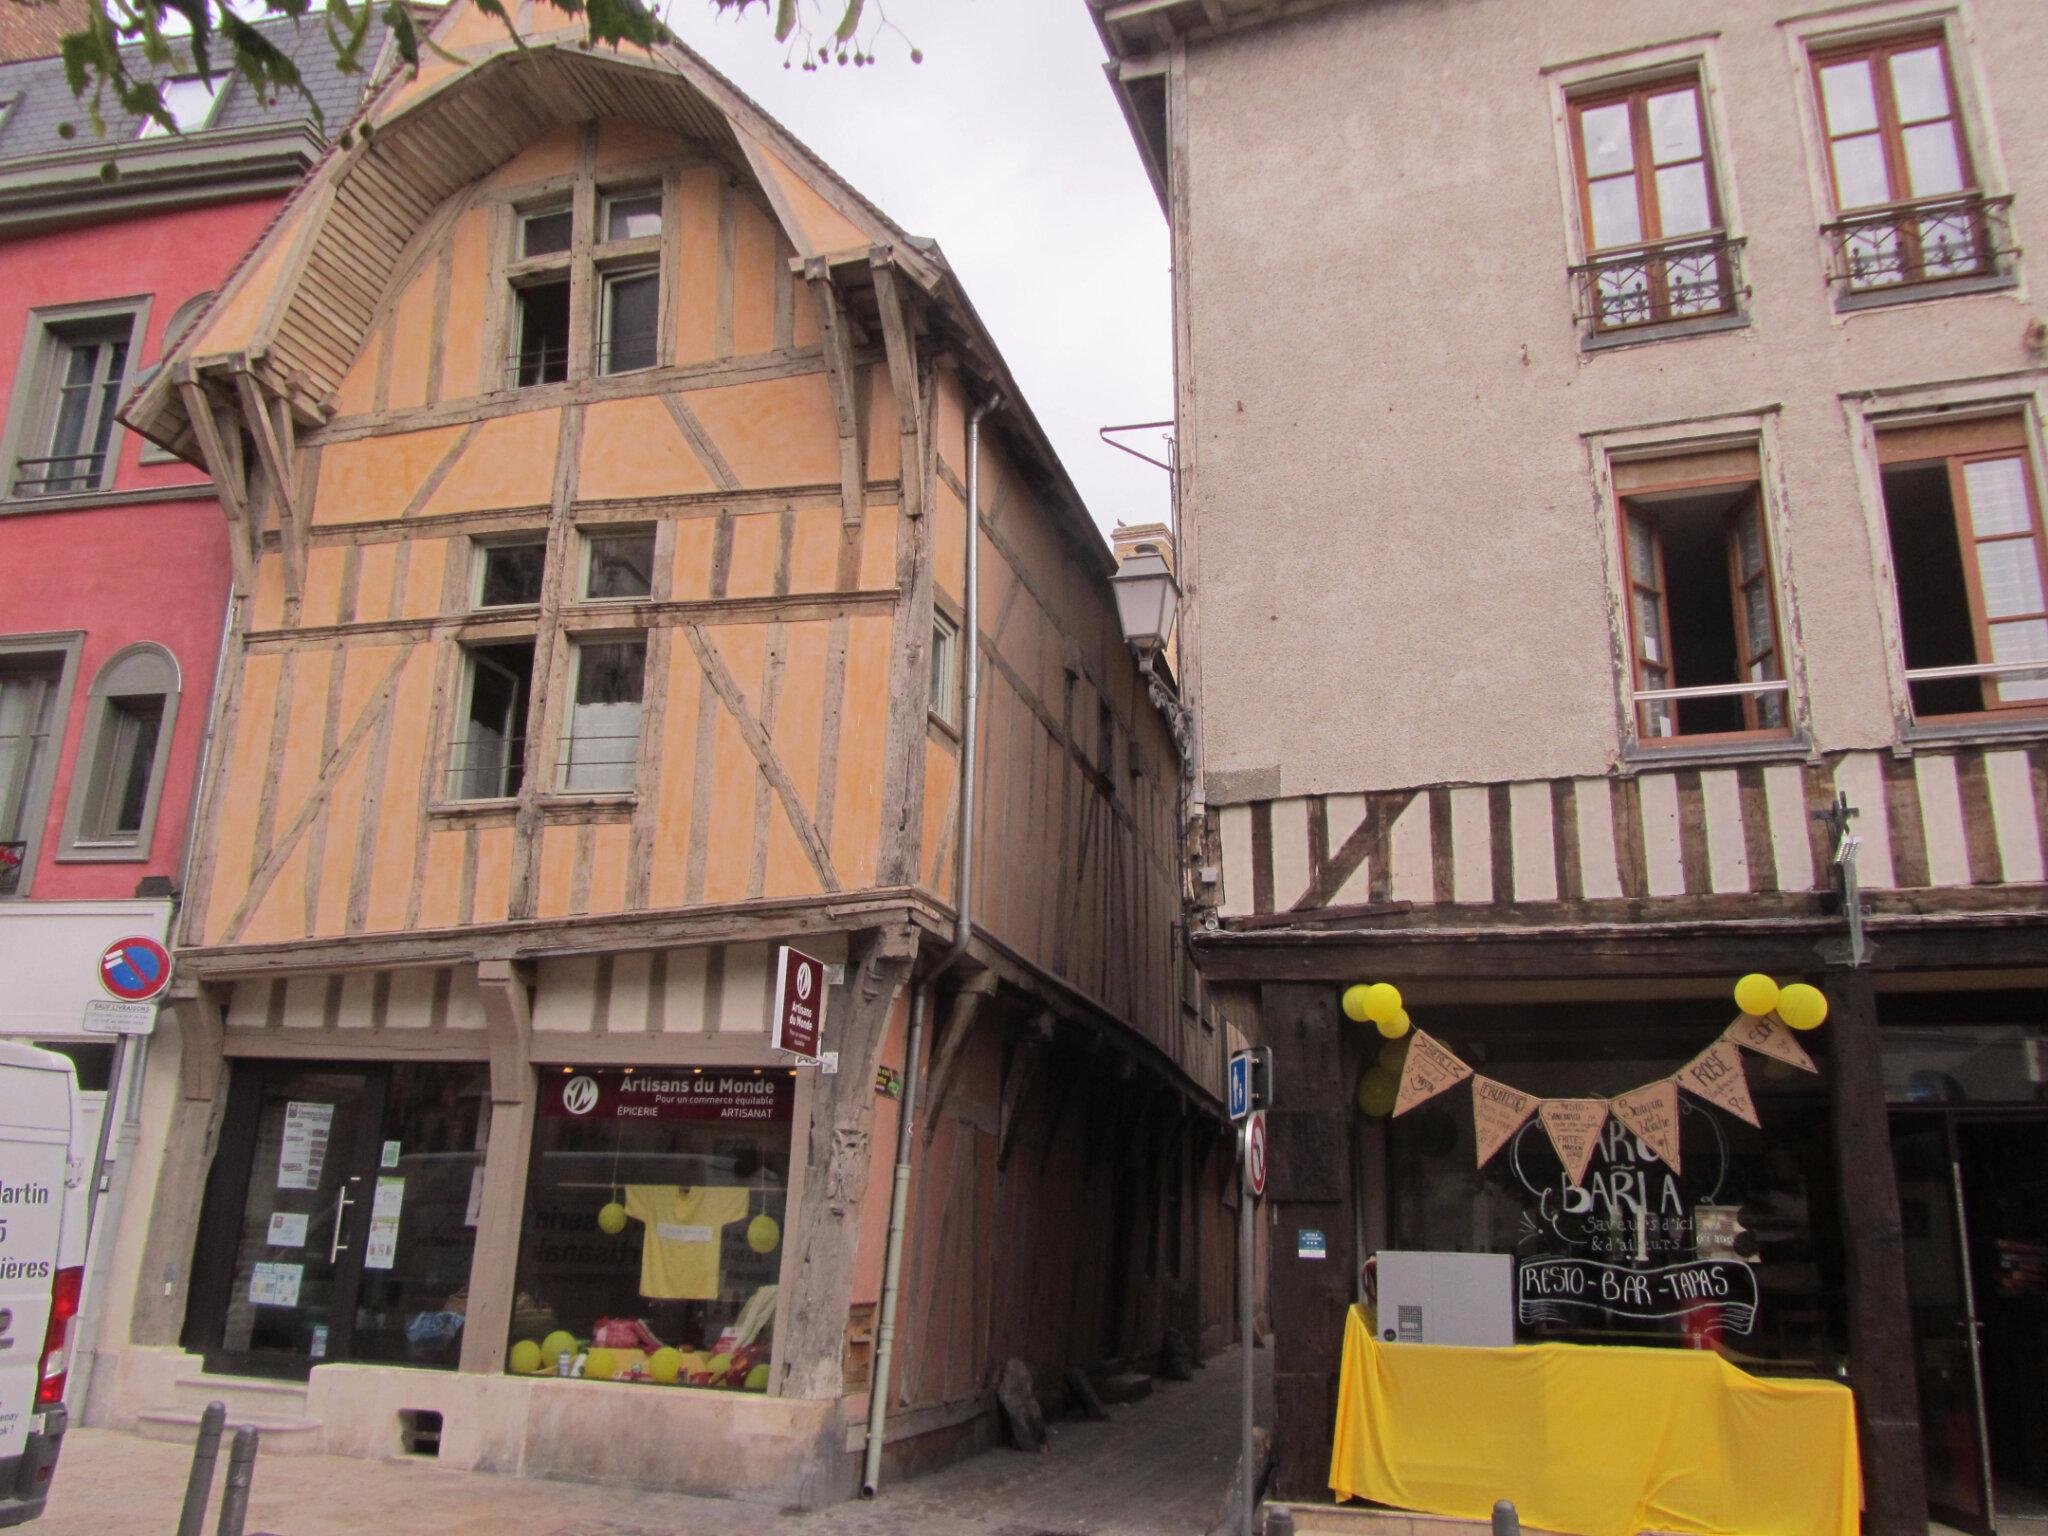 6 juillet 2017 - Visite du vieux Troyes